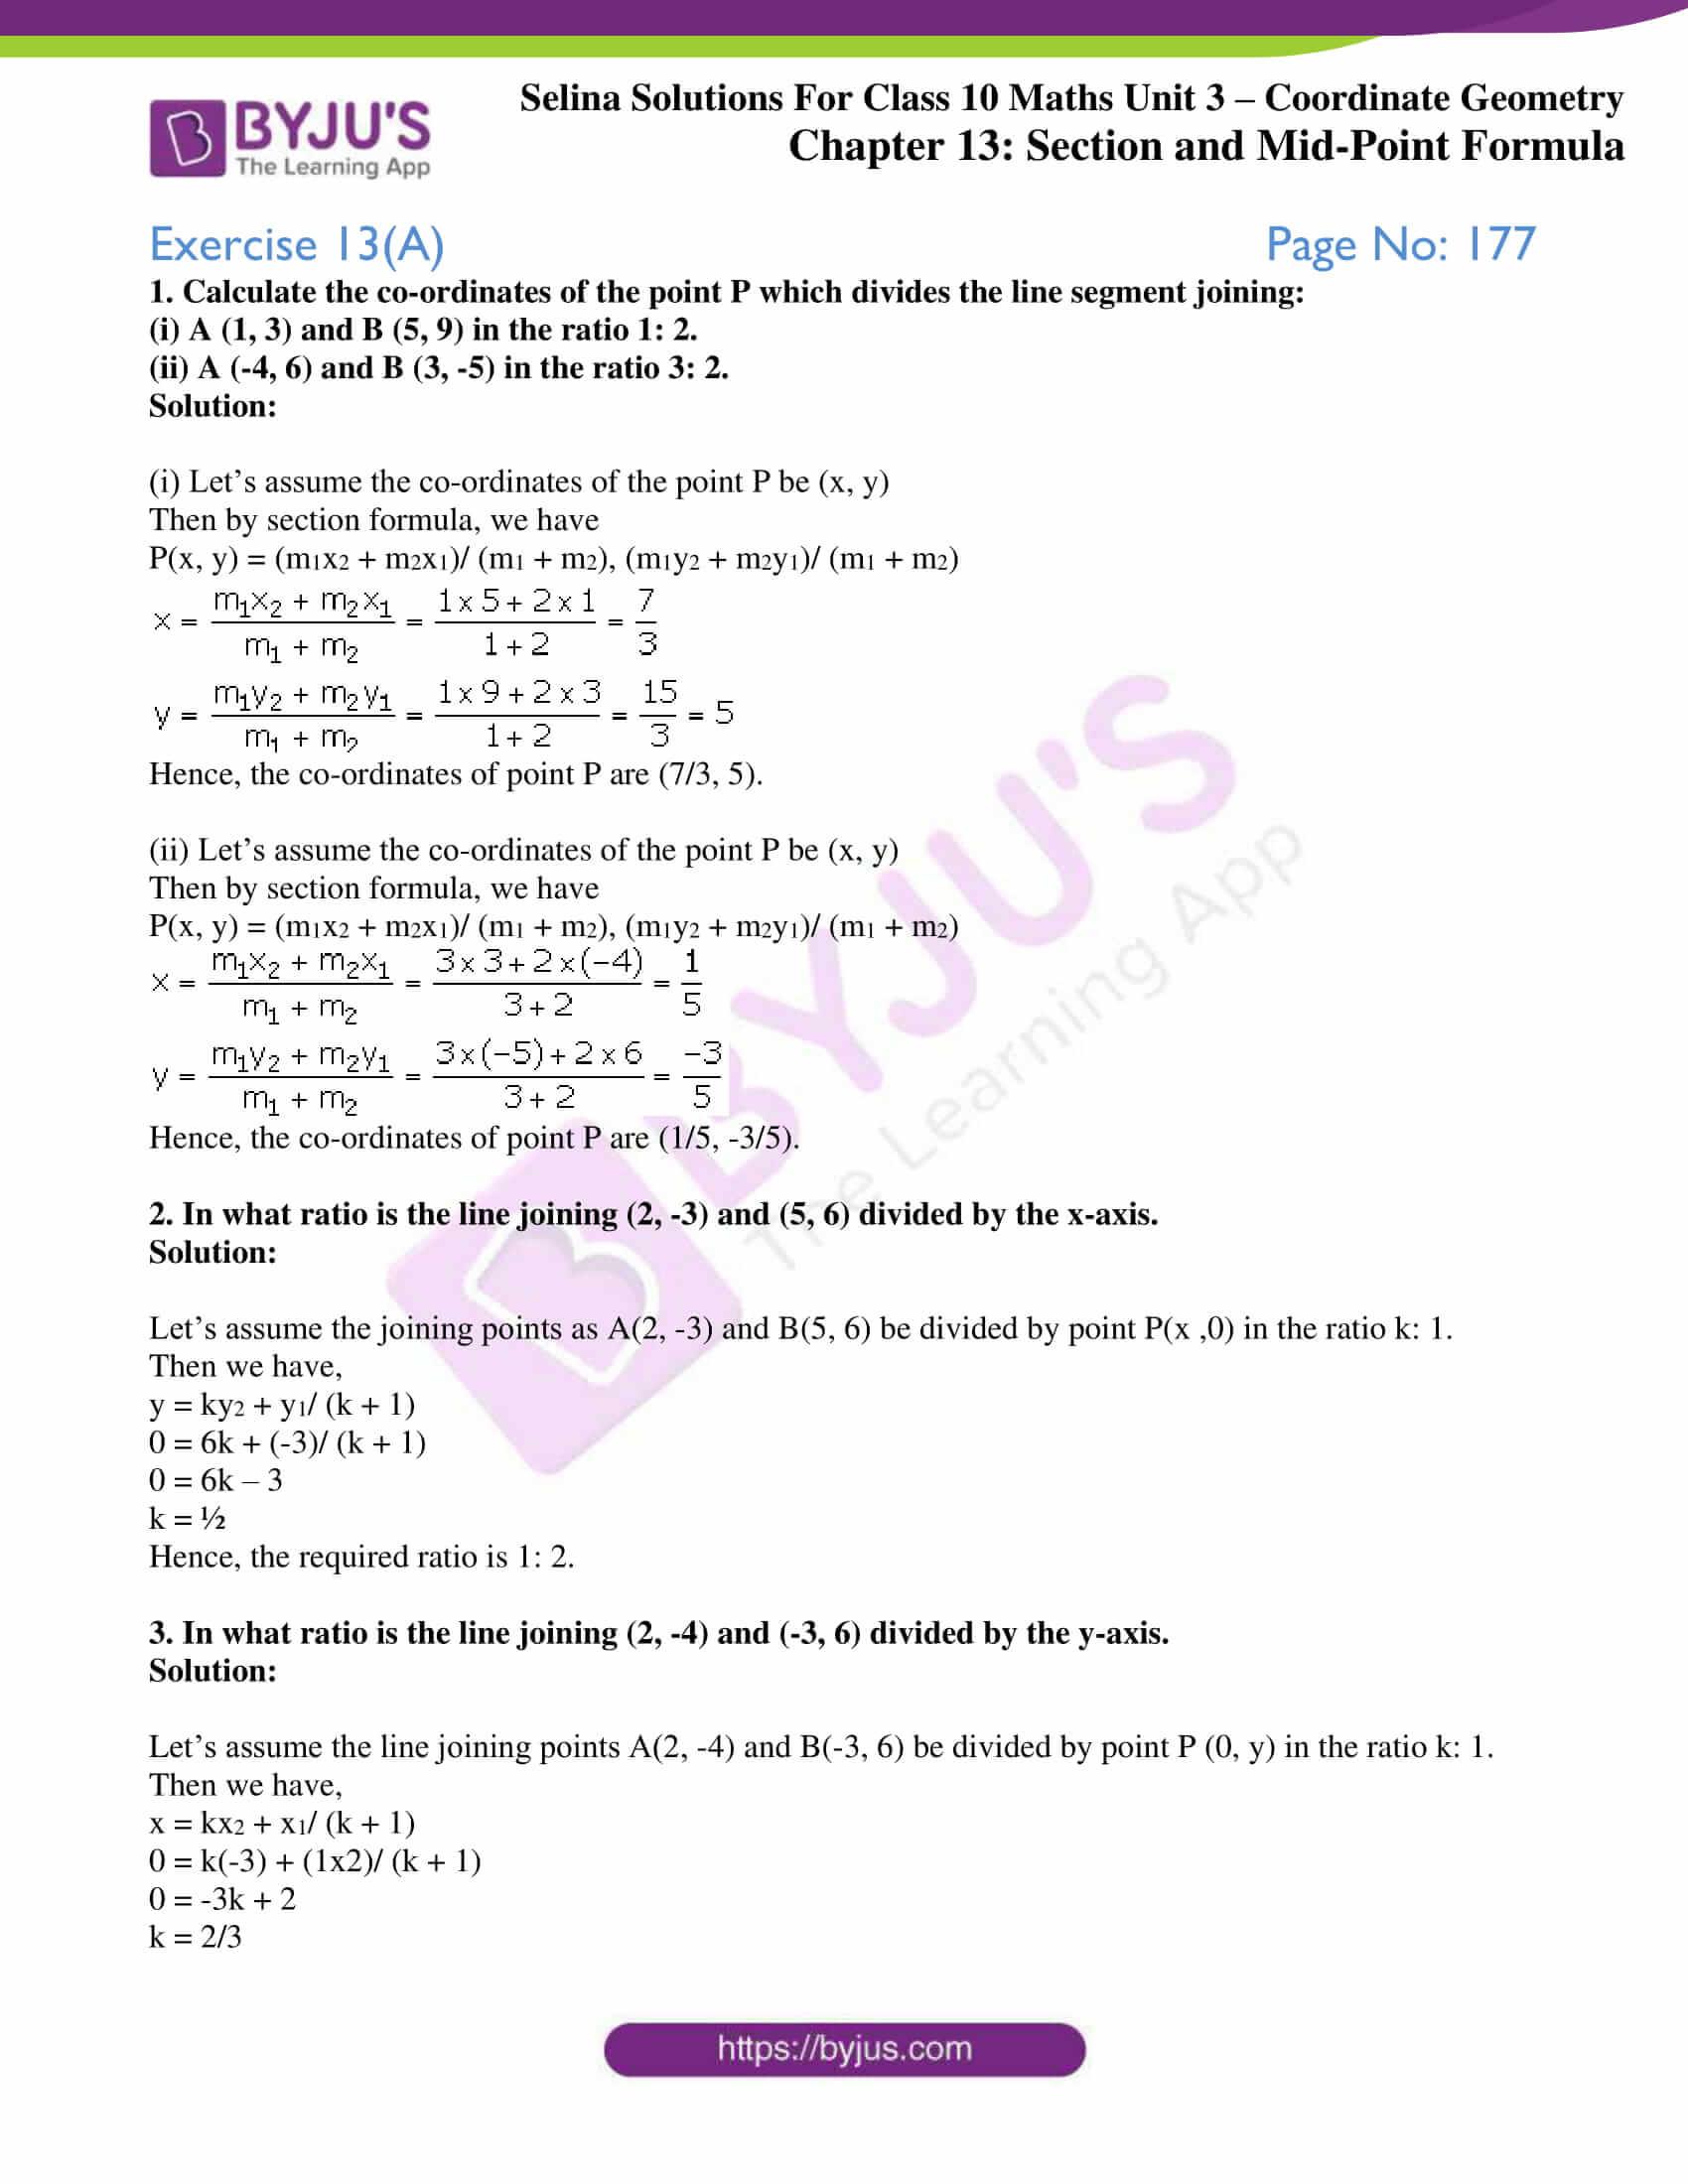 selina-sol-maths-class-10-ch-13-ex-a-1